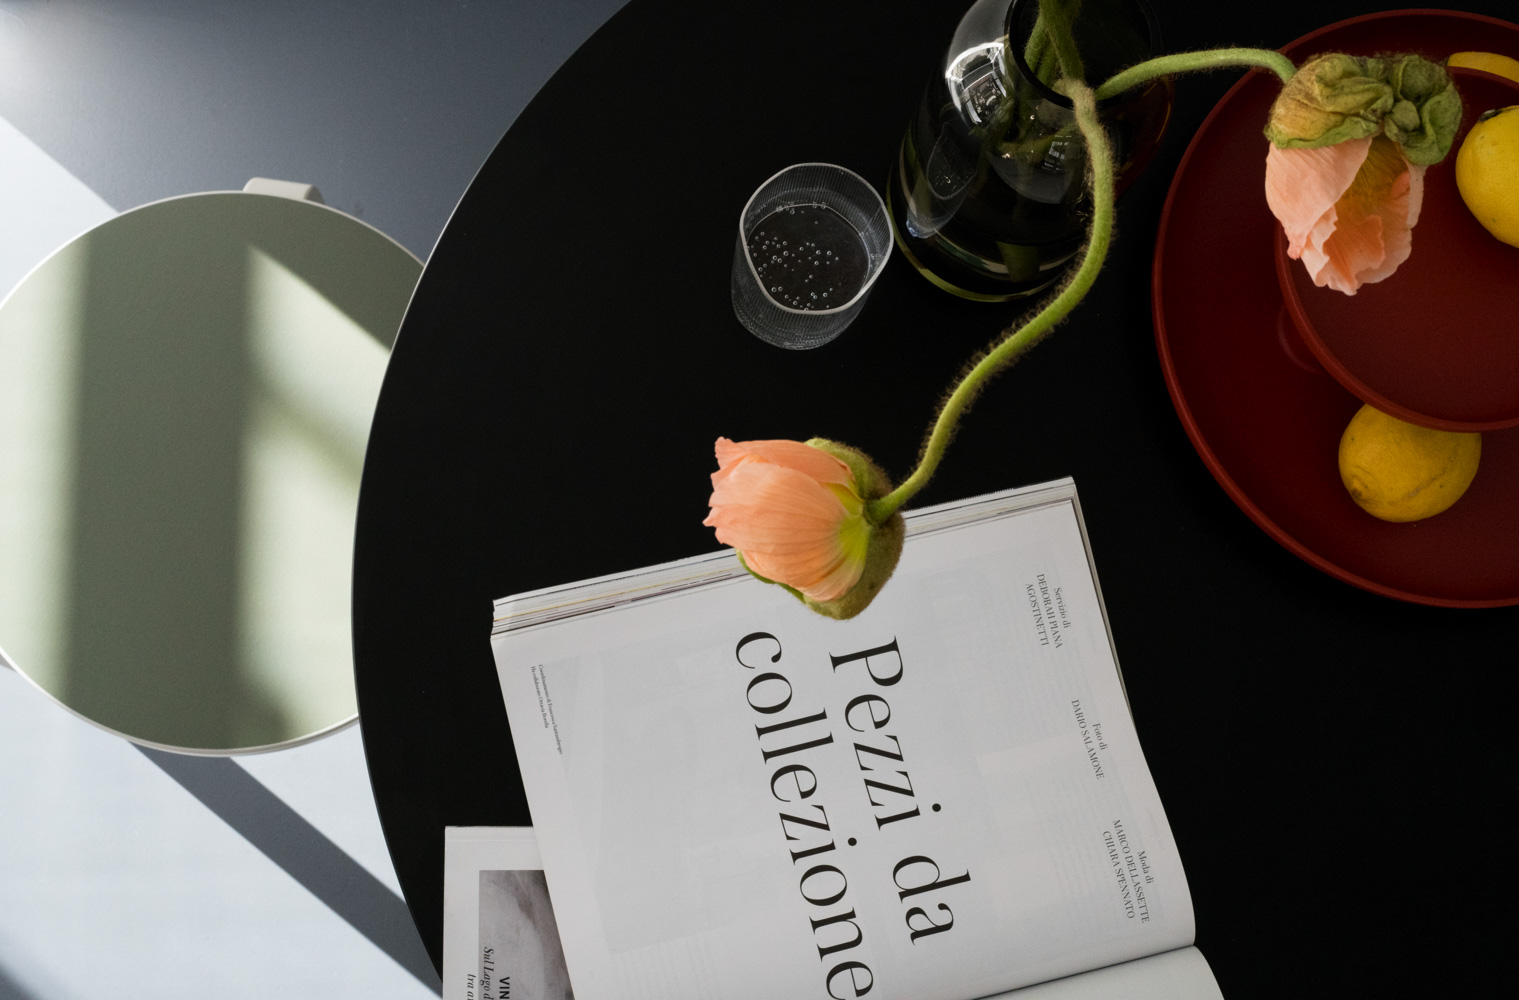 ilenia-martini-vitra_01-16.jpg